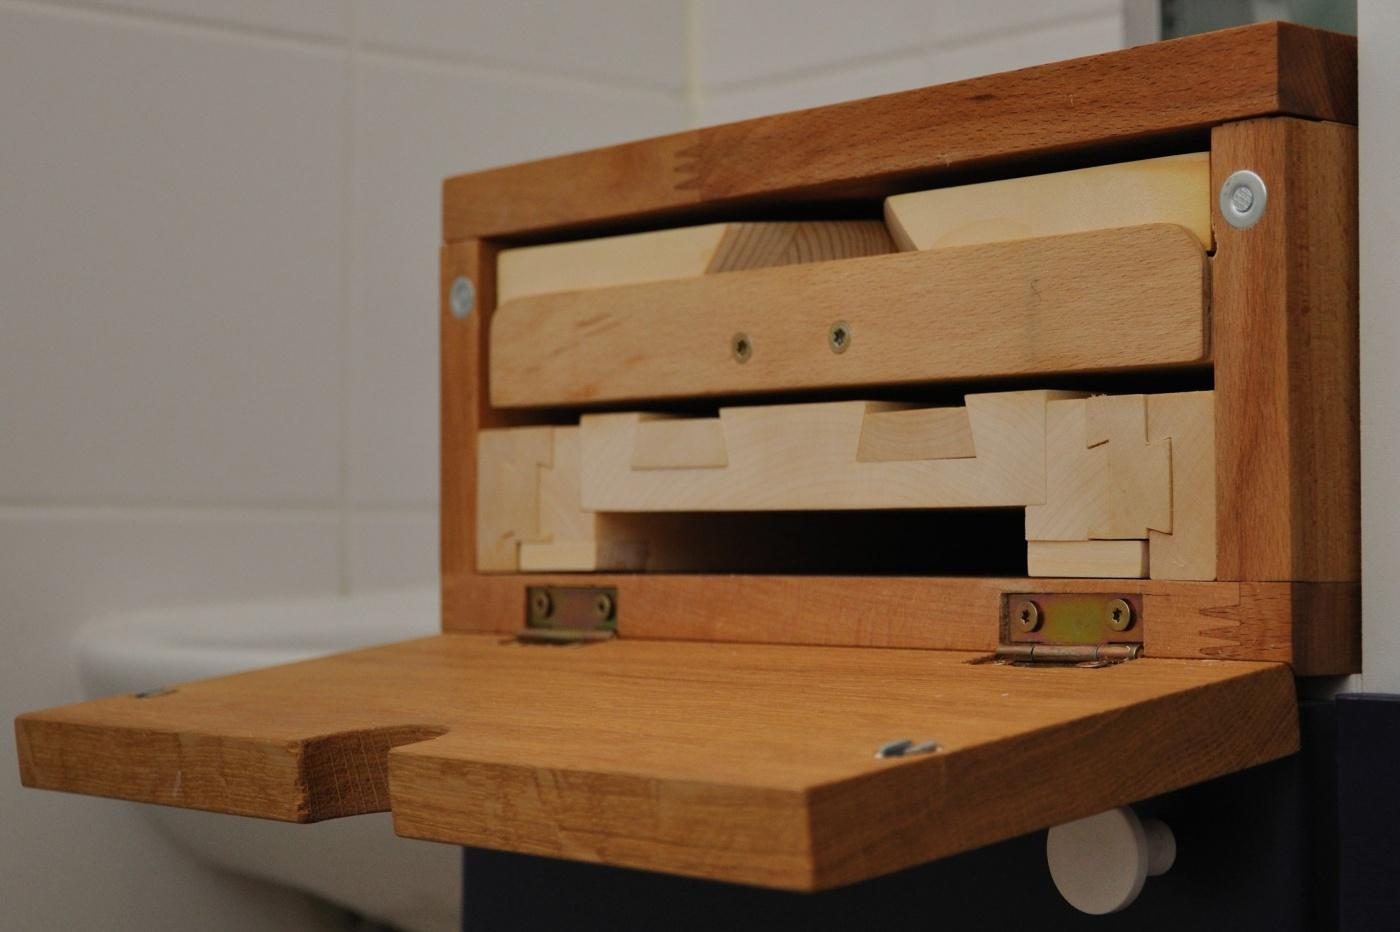 holz notizen lesest tze ausziehbar. Black Bedroom Furniture Sets. Home Design Ideas